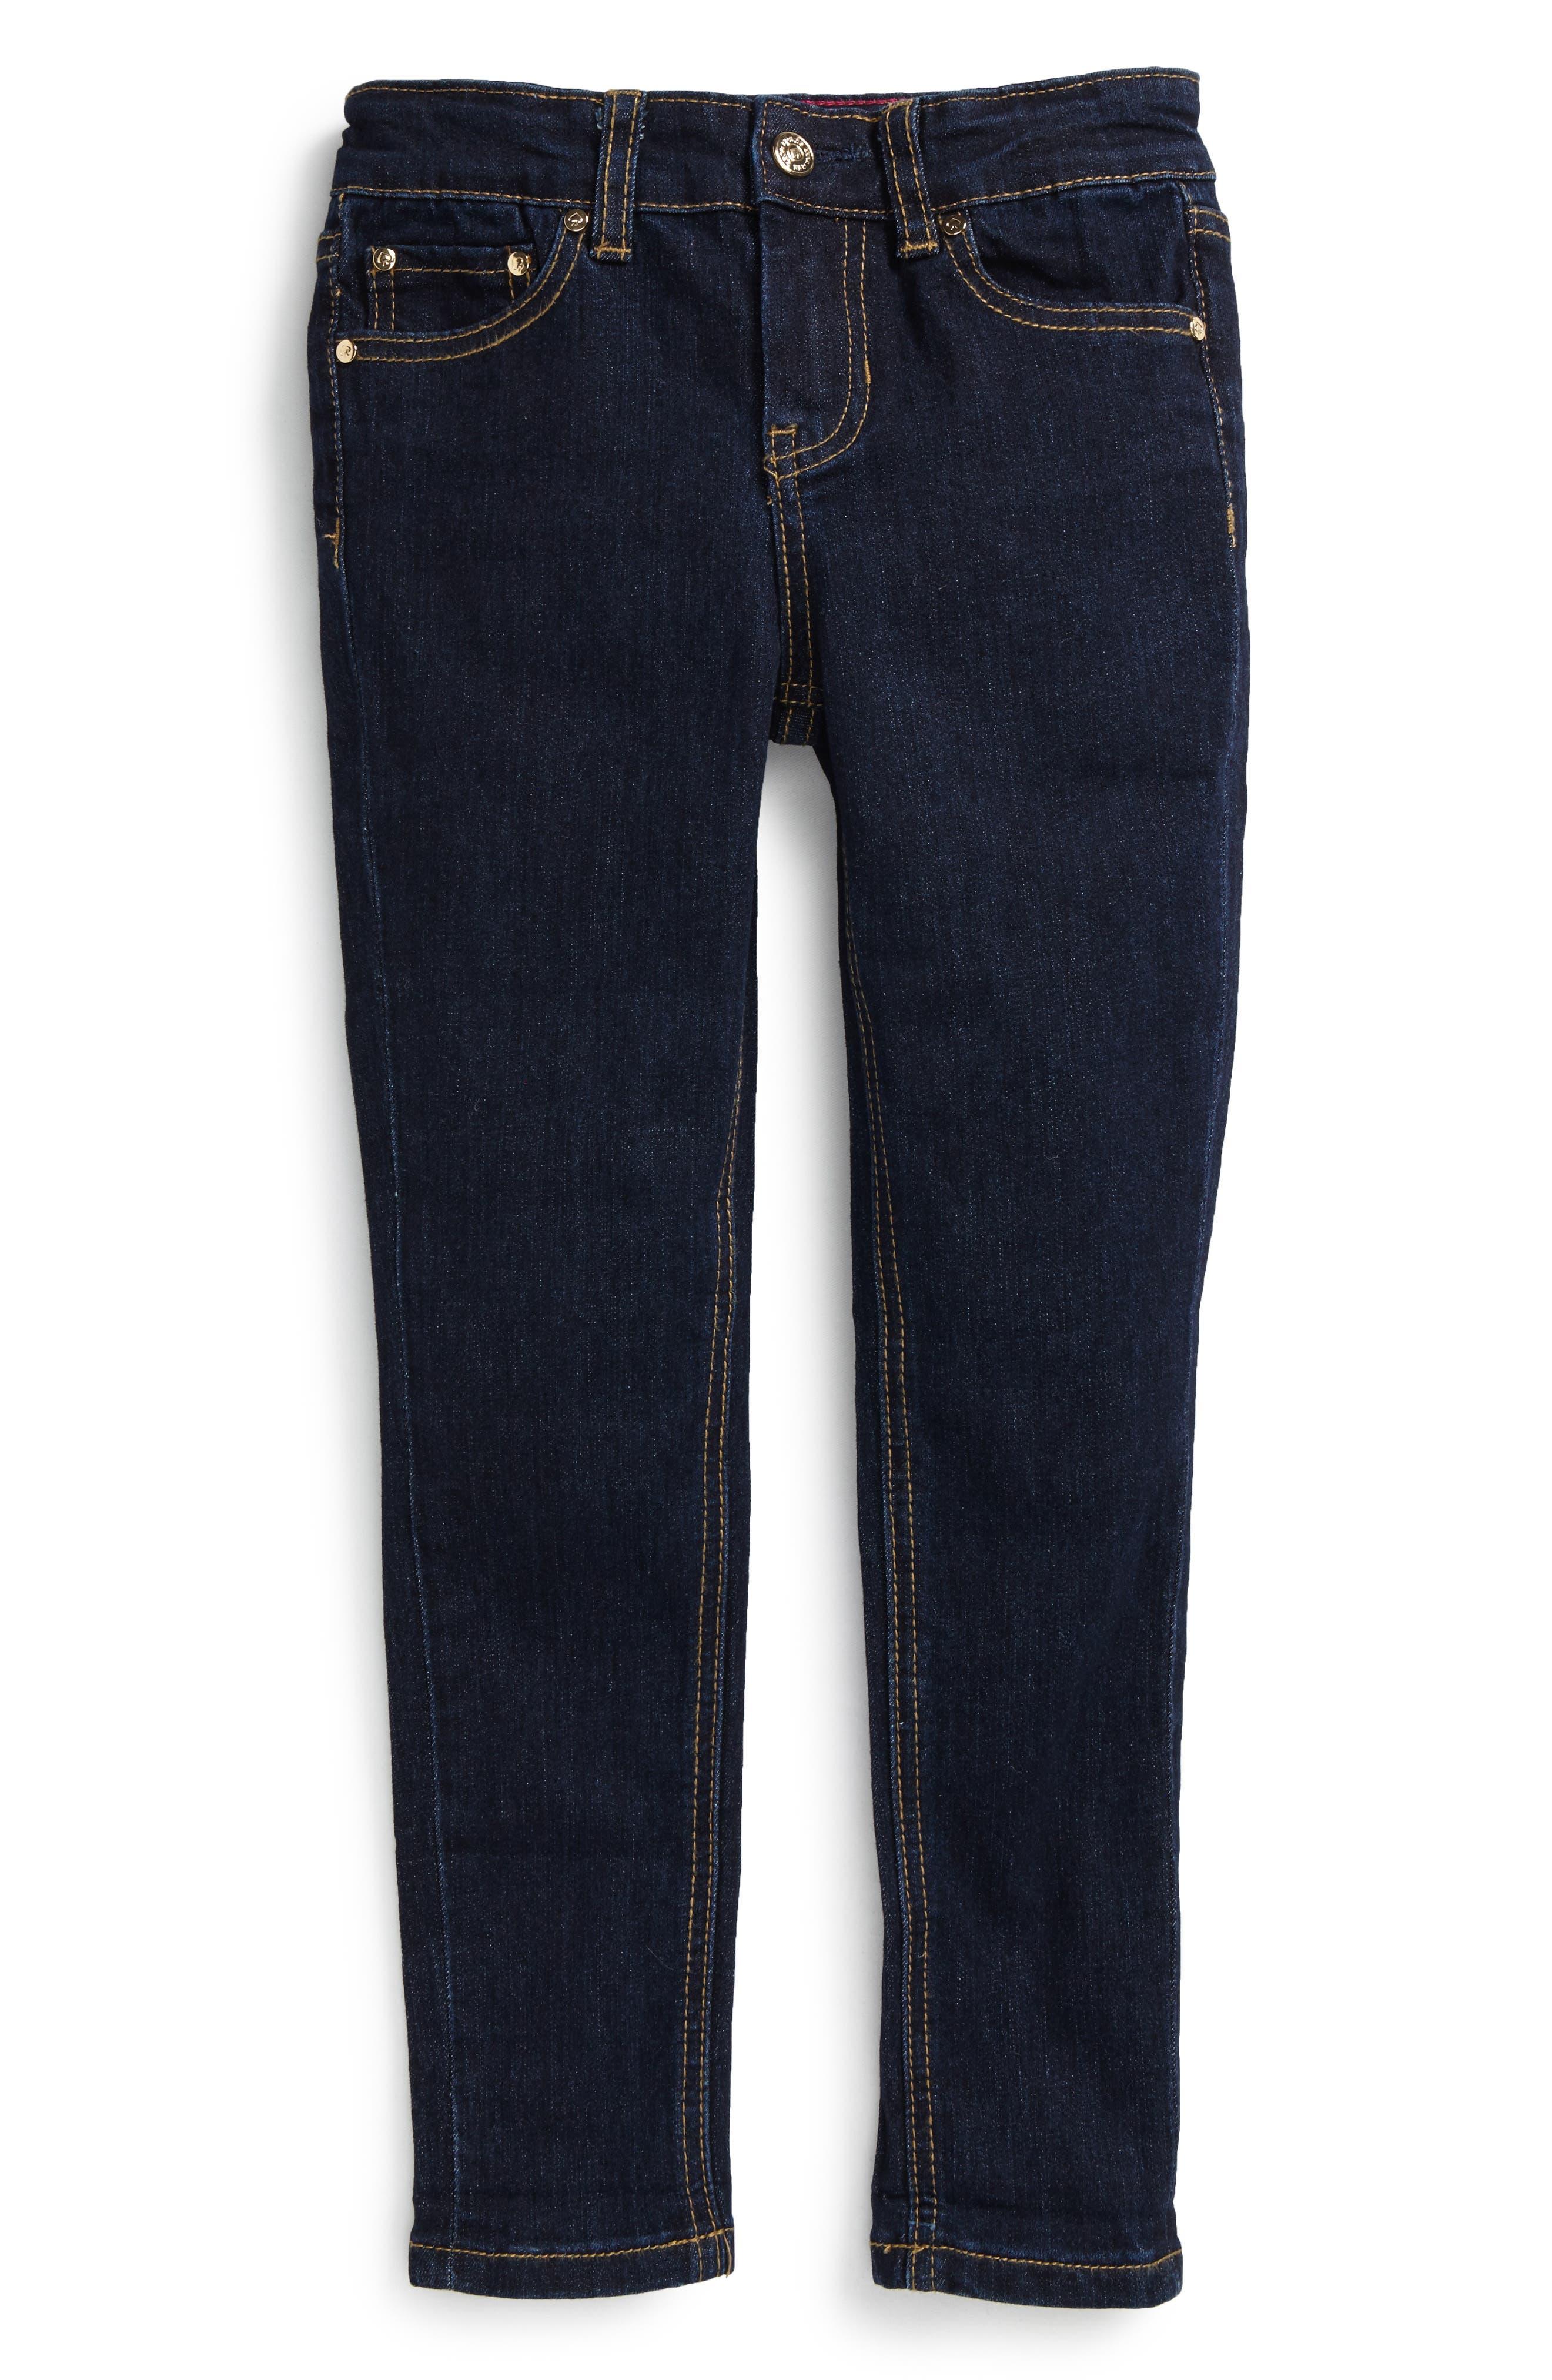 Alternate Image 1 Selected - kate spade new york skinny stretch jeans (Toddler Girls & Little Girls)